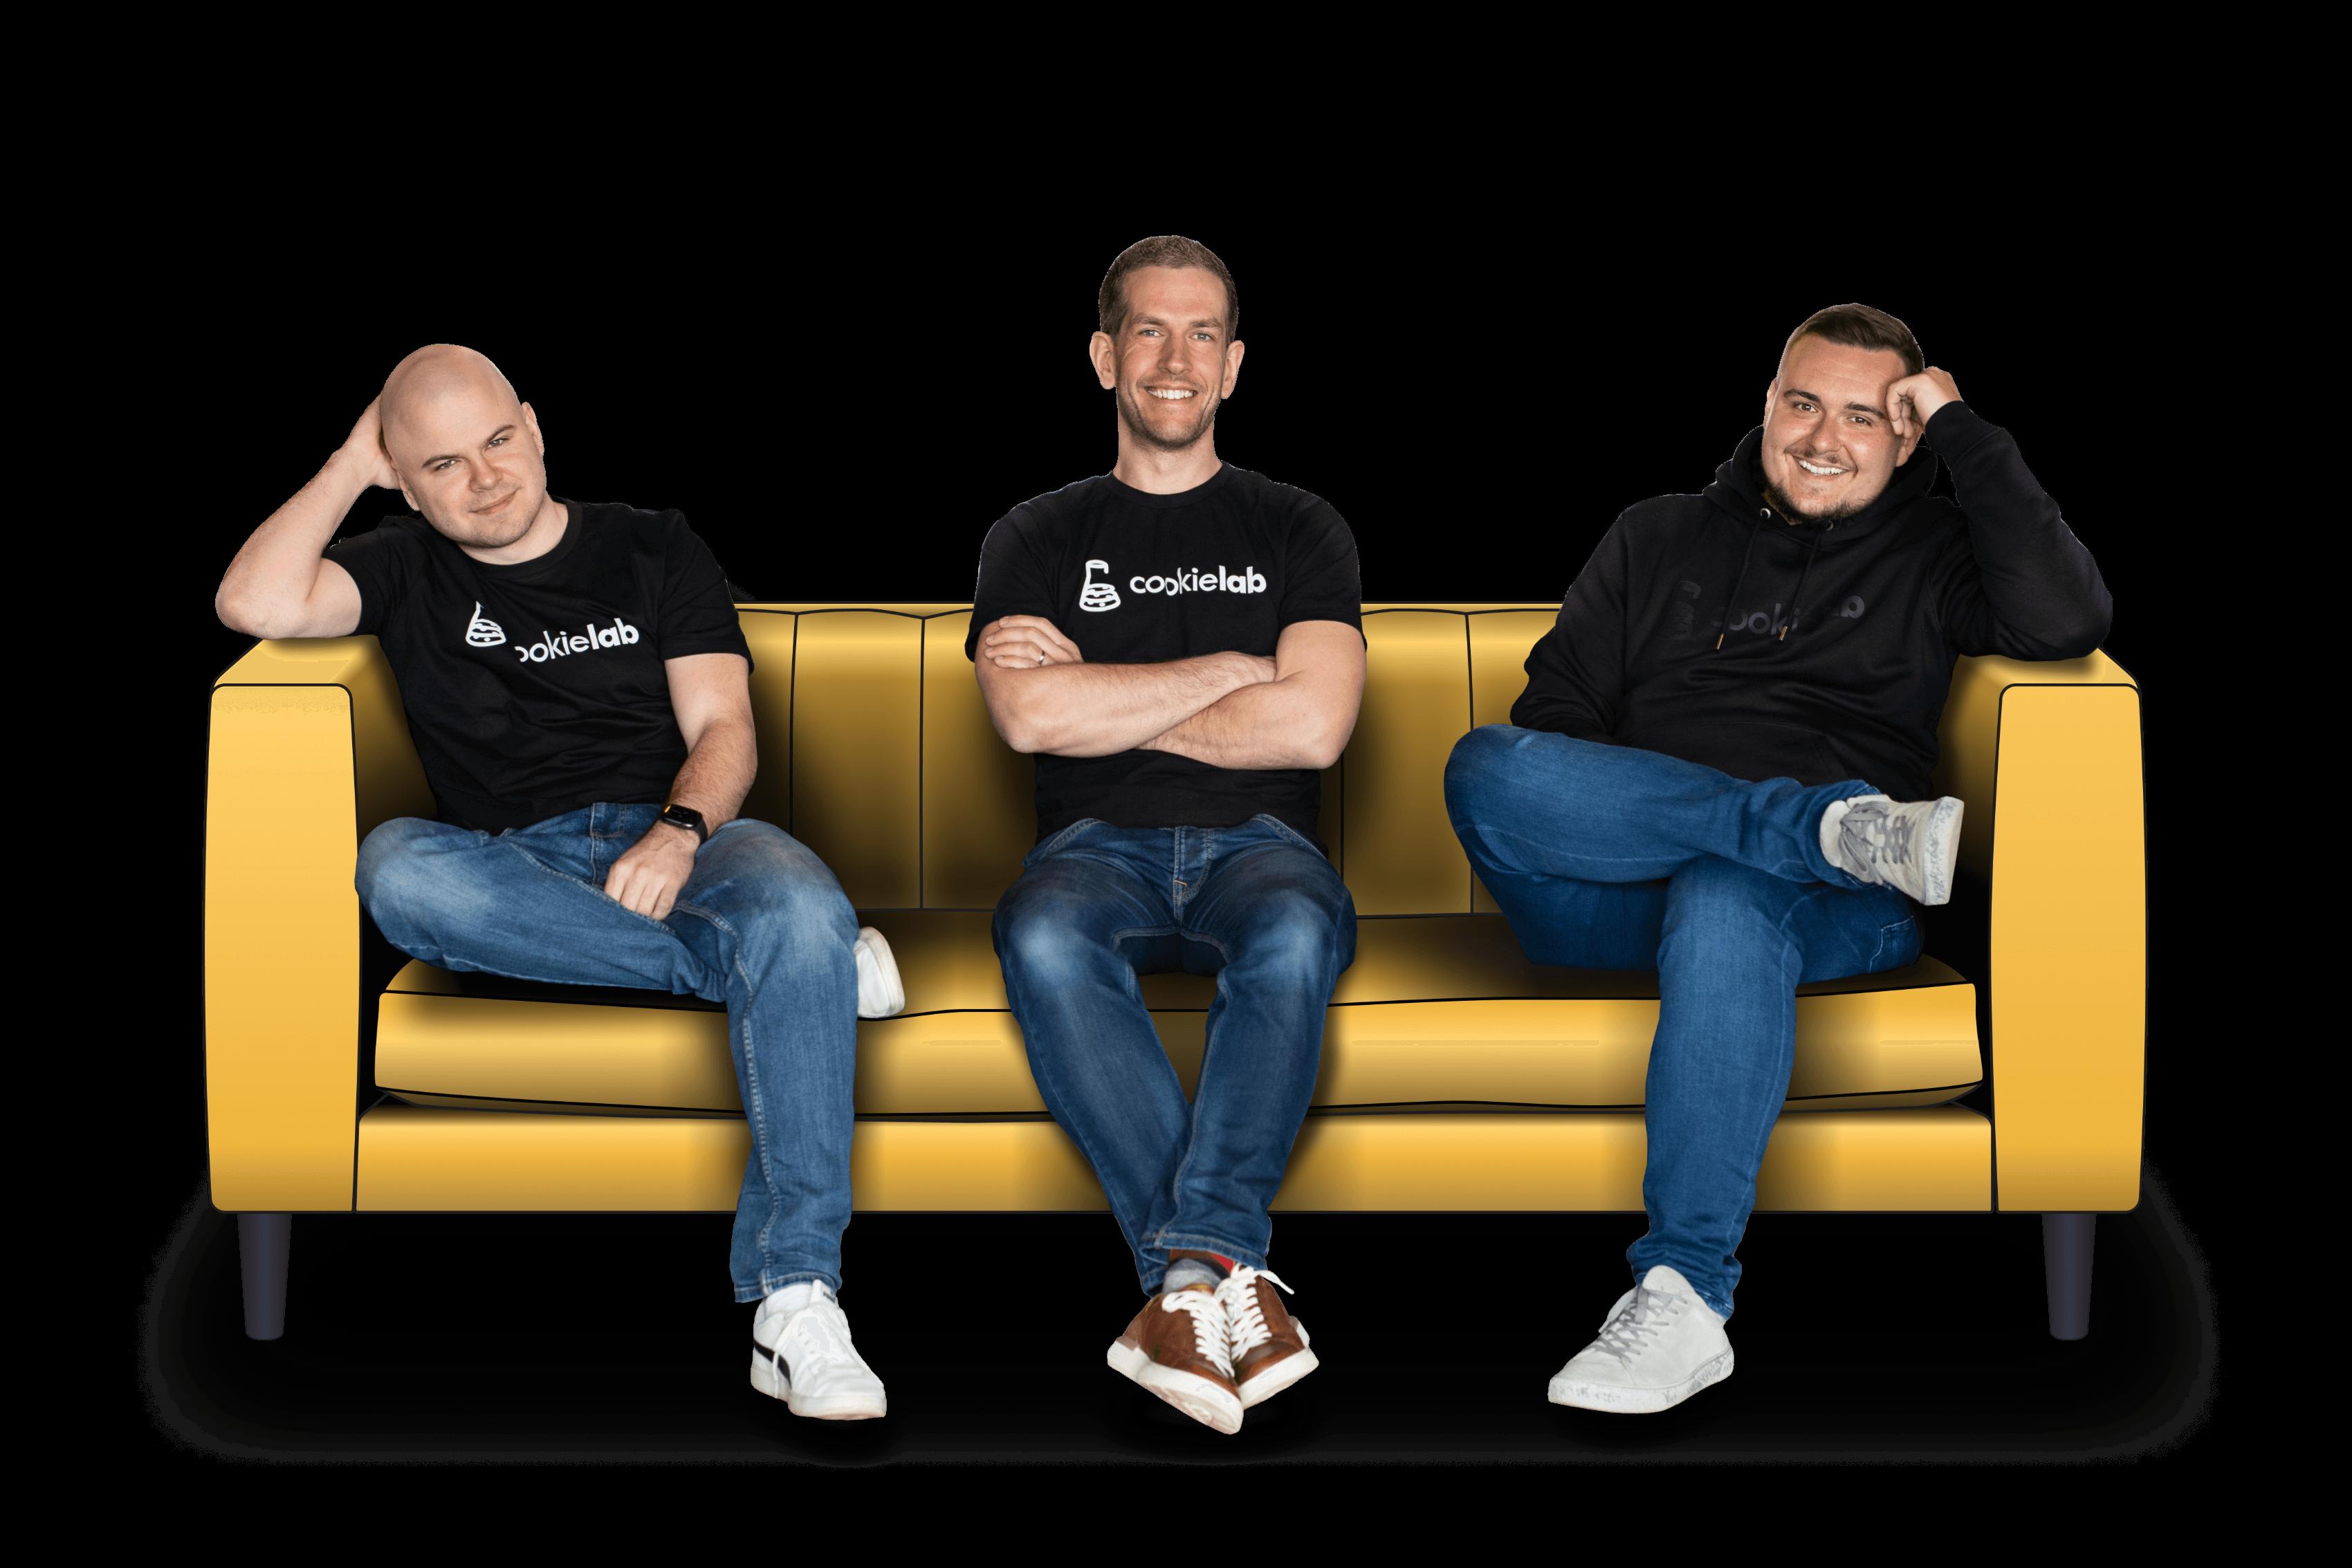 Martin Homolka, Radek Míka, Jakub Kohout - CO-Fouonders